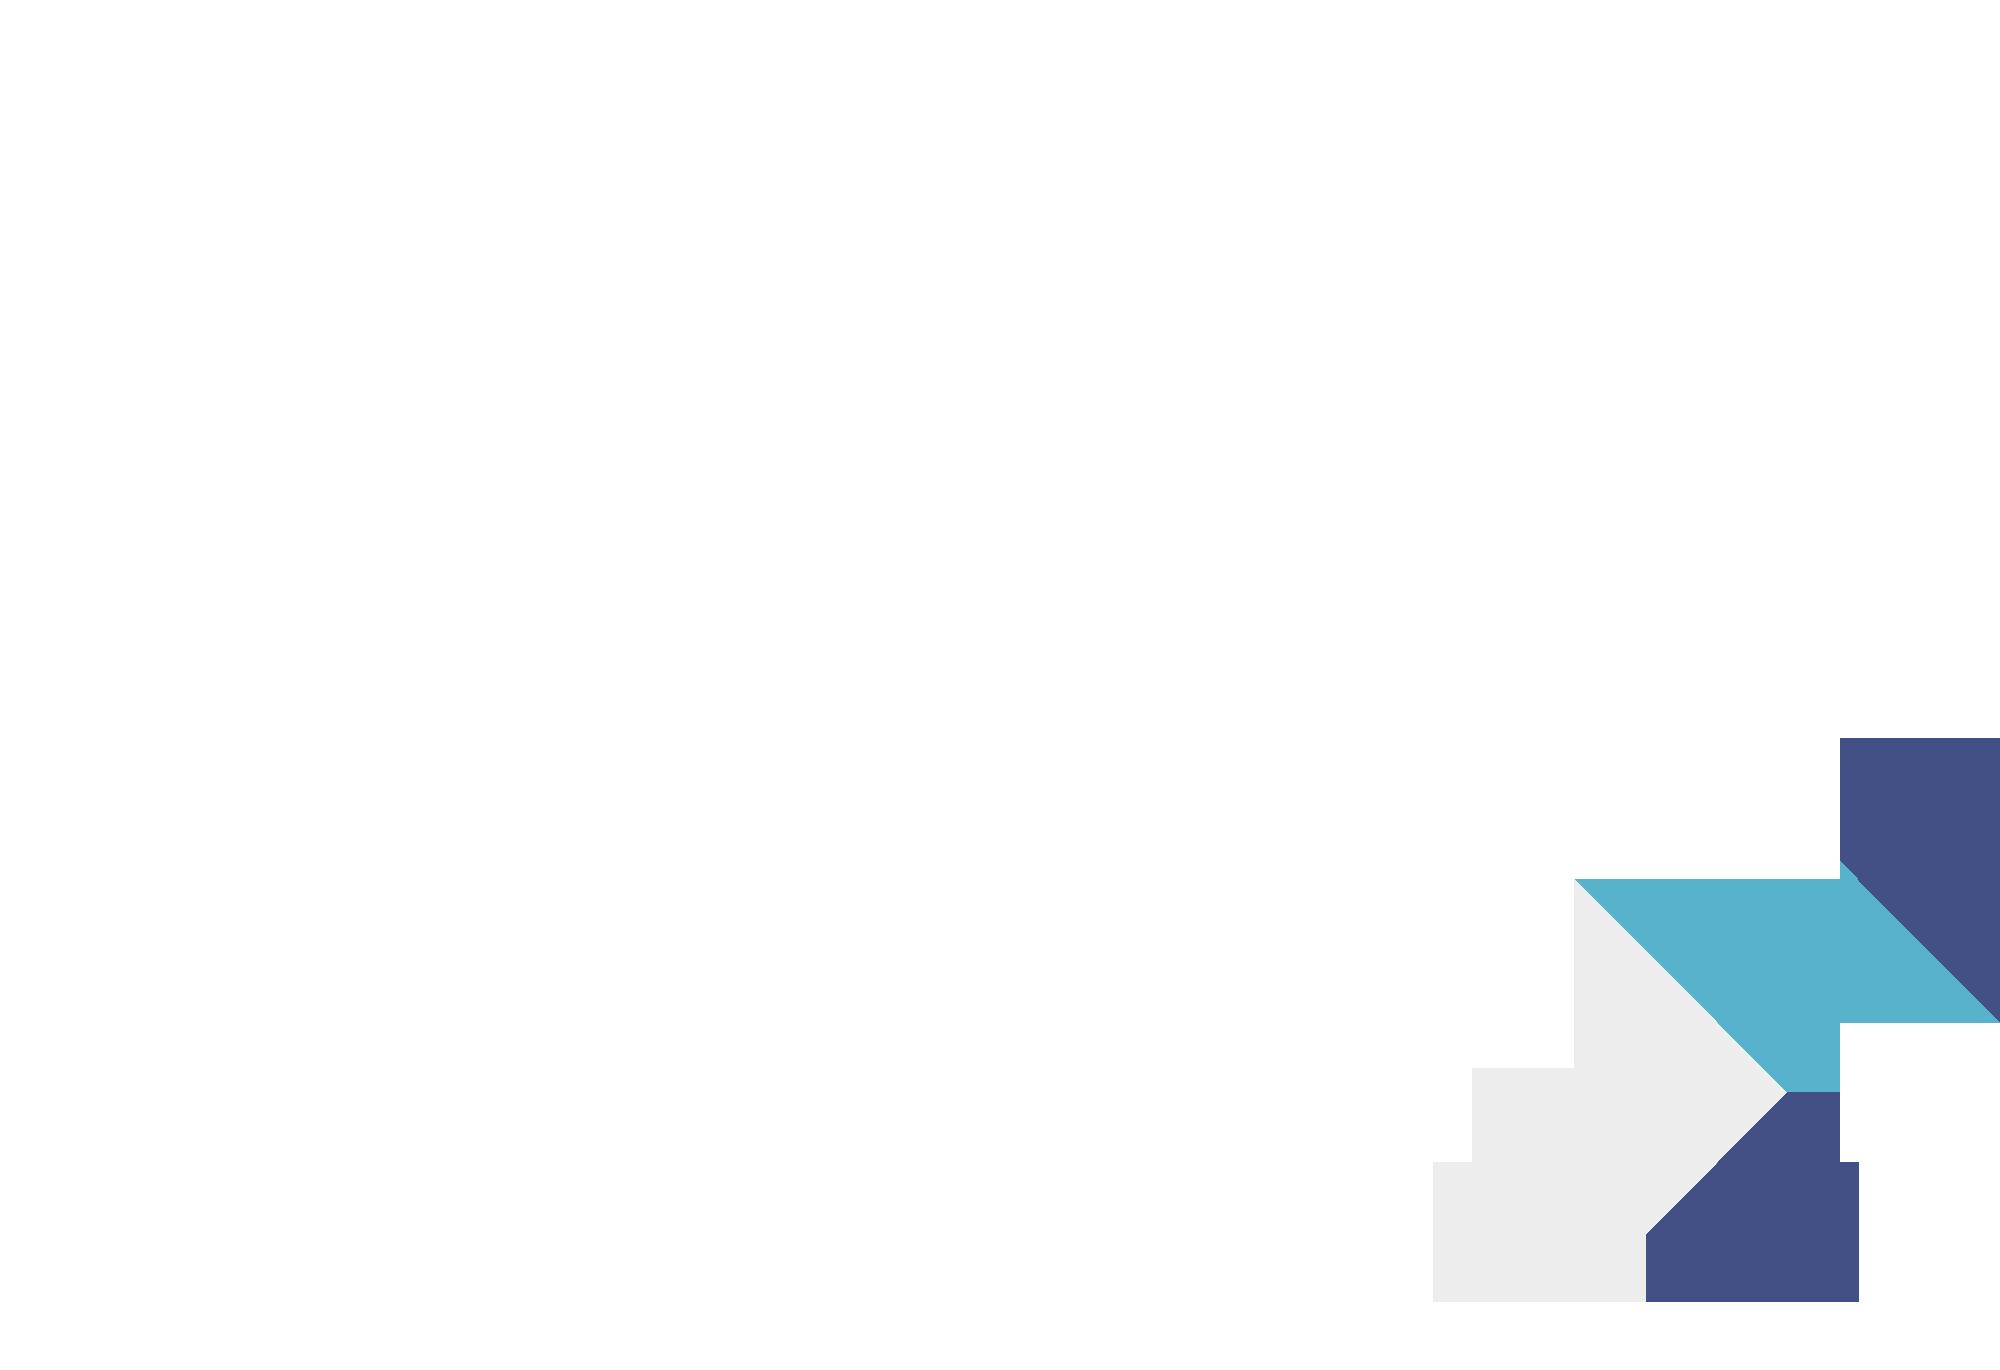 Brand Elite - What We Do - Block Box Design 4